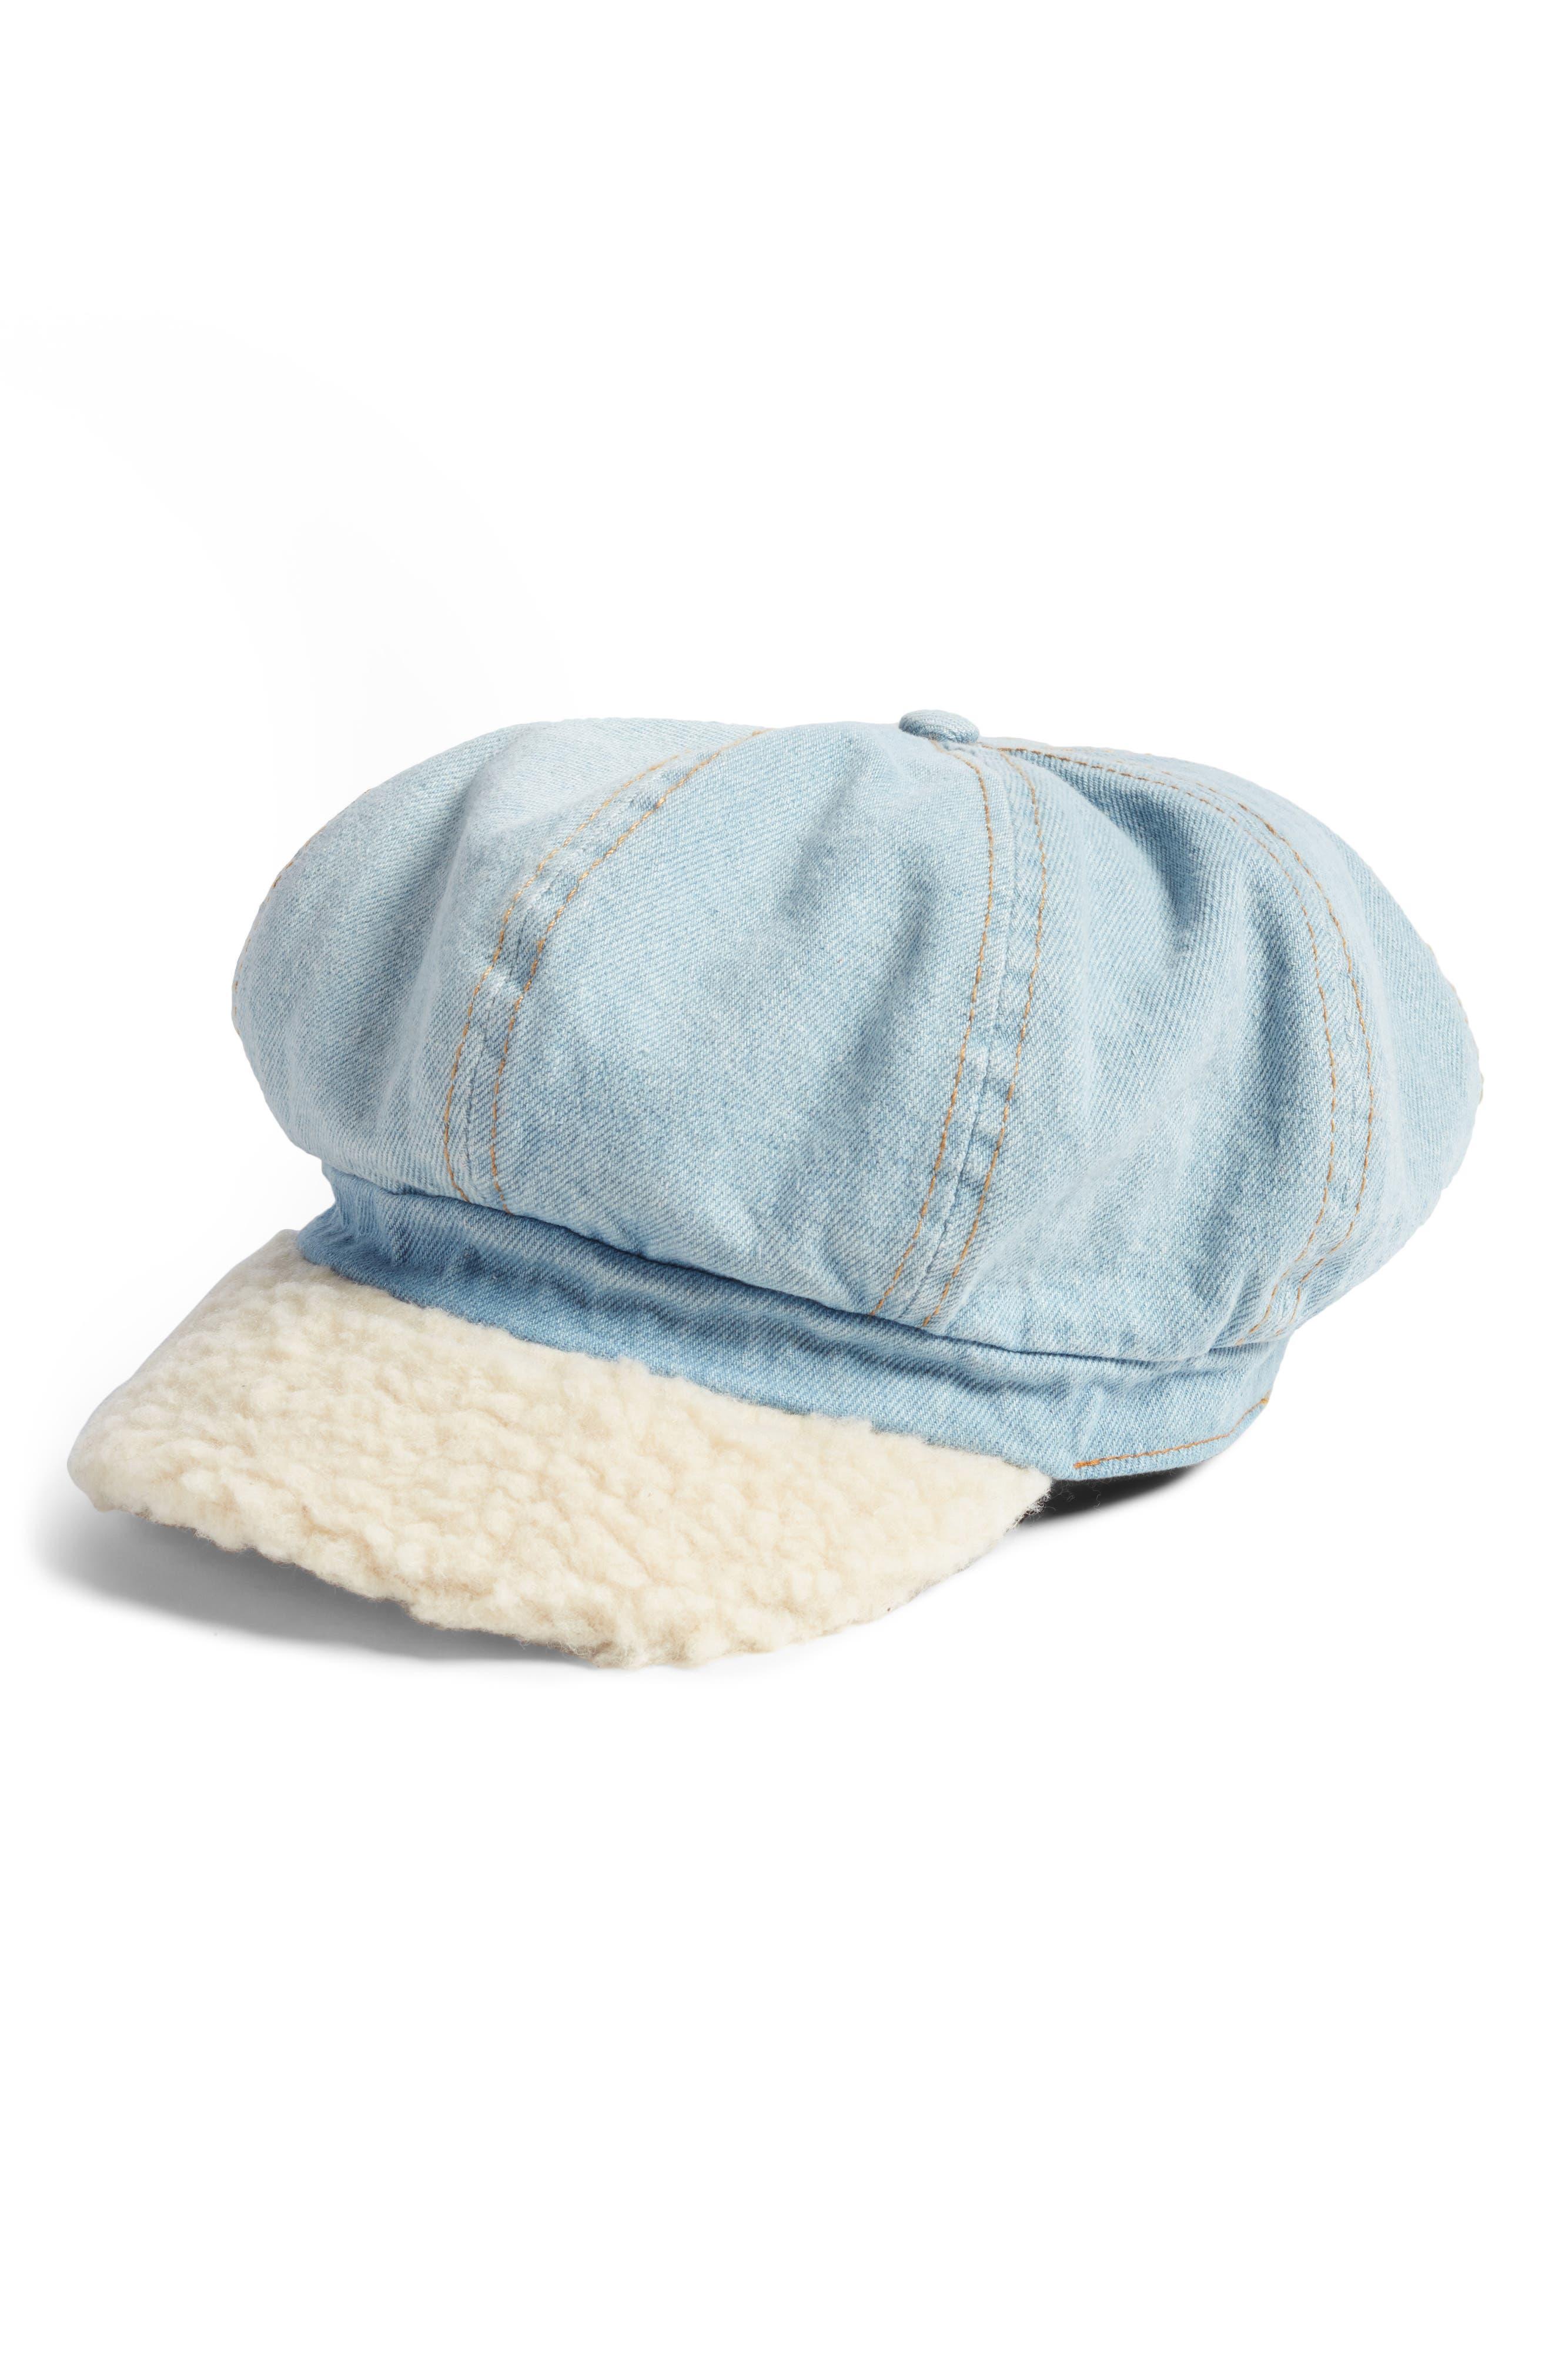 Faux Shearling & Denim Baker Boy Hat,                         Main,                         color, Blue